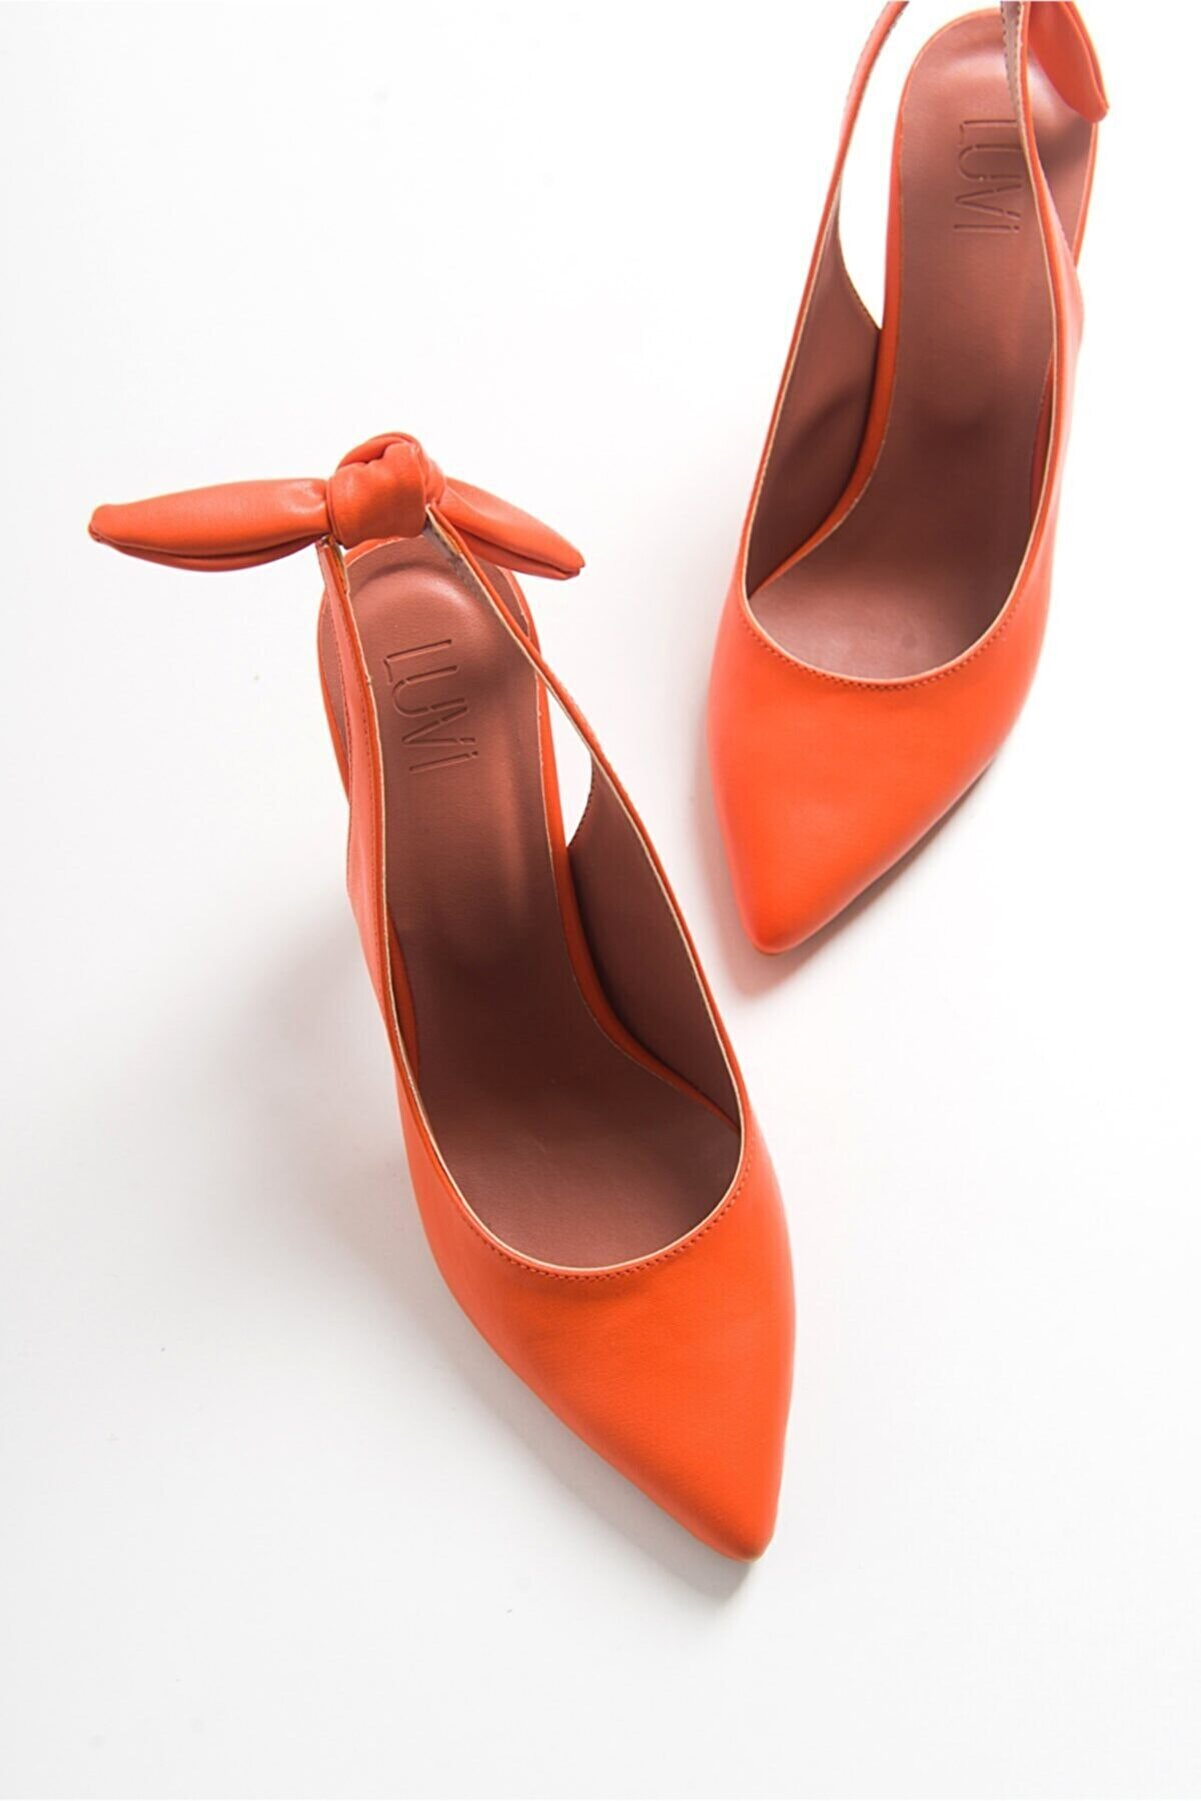 luvishoes Kadın Turuncu Cılt Topuklu Sandalet